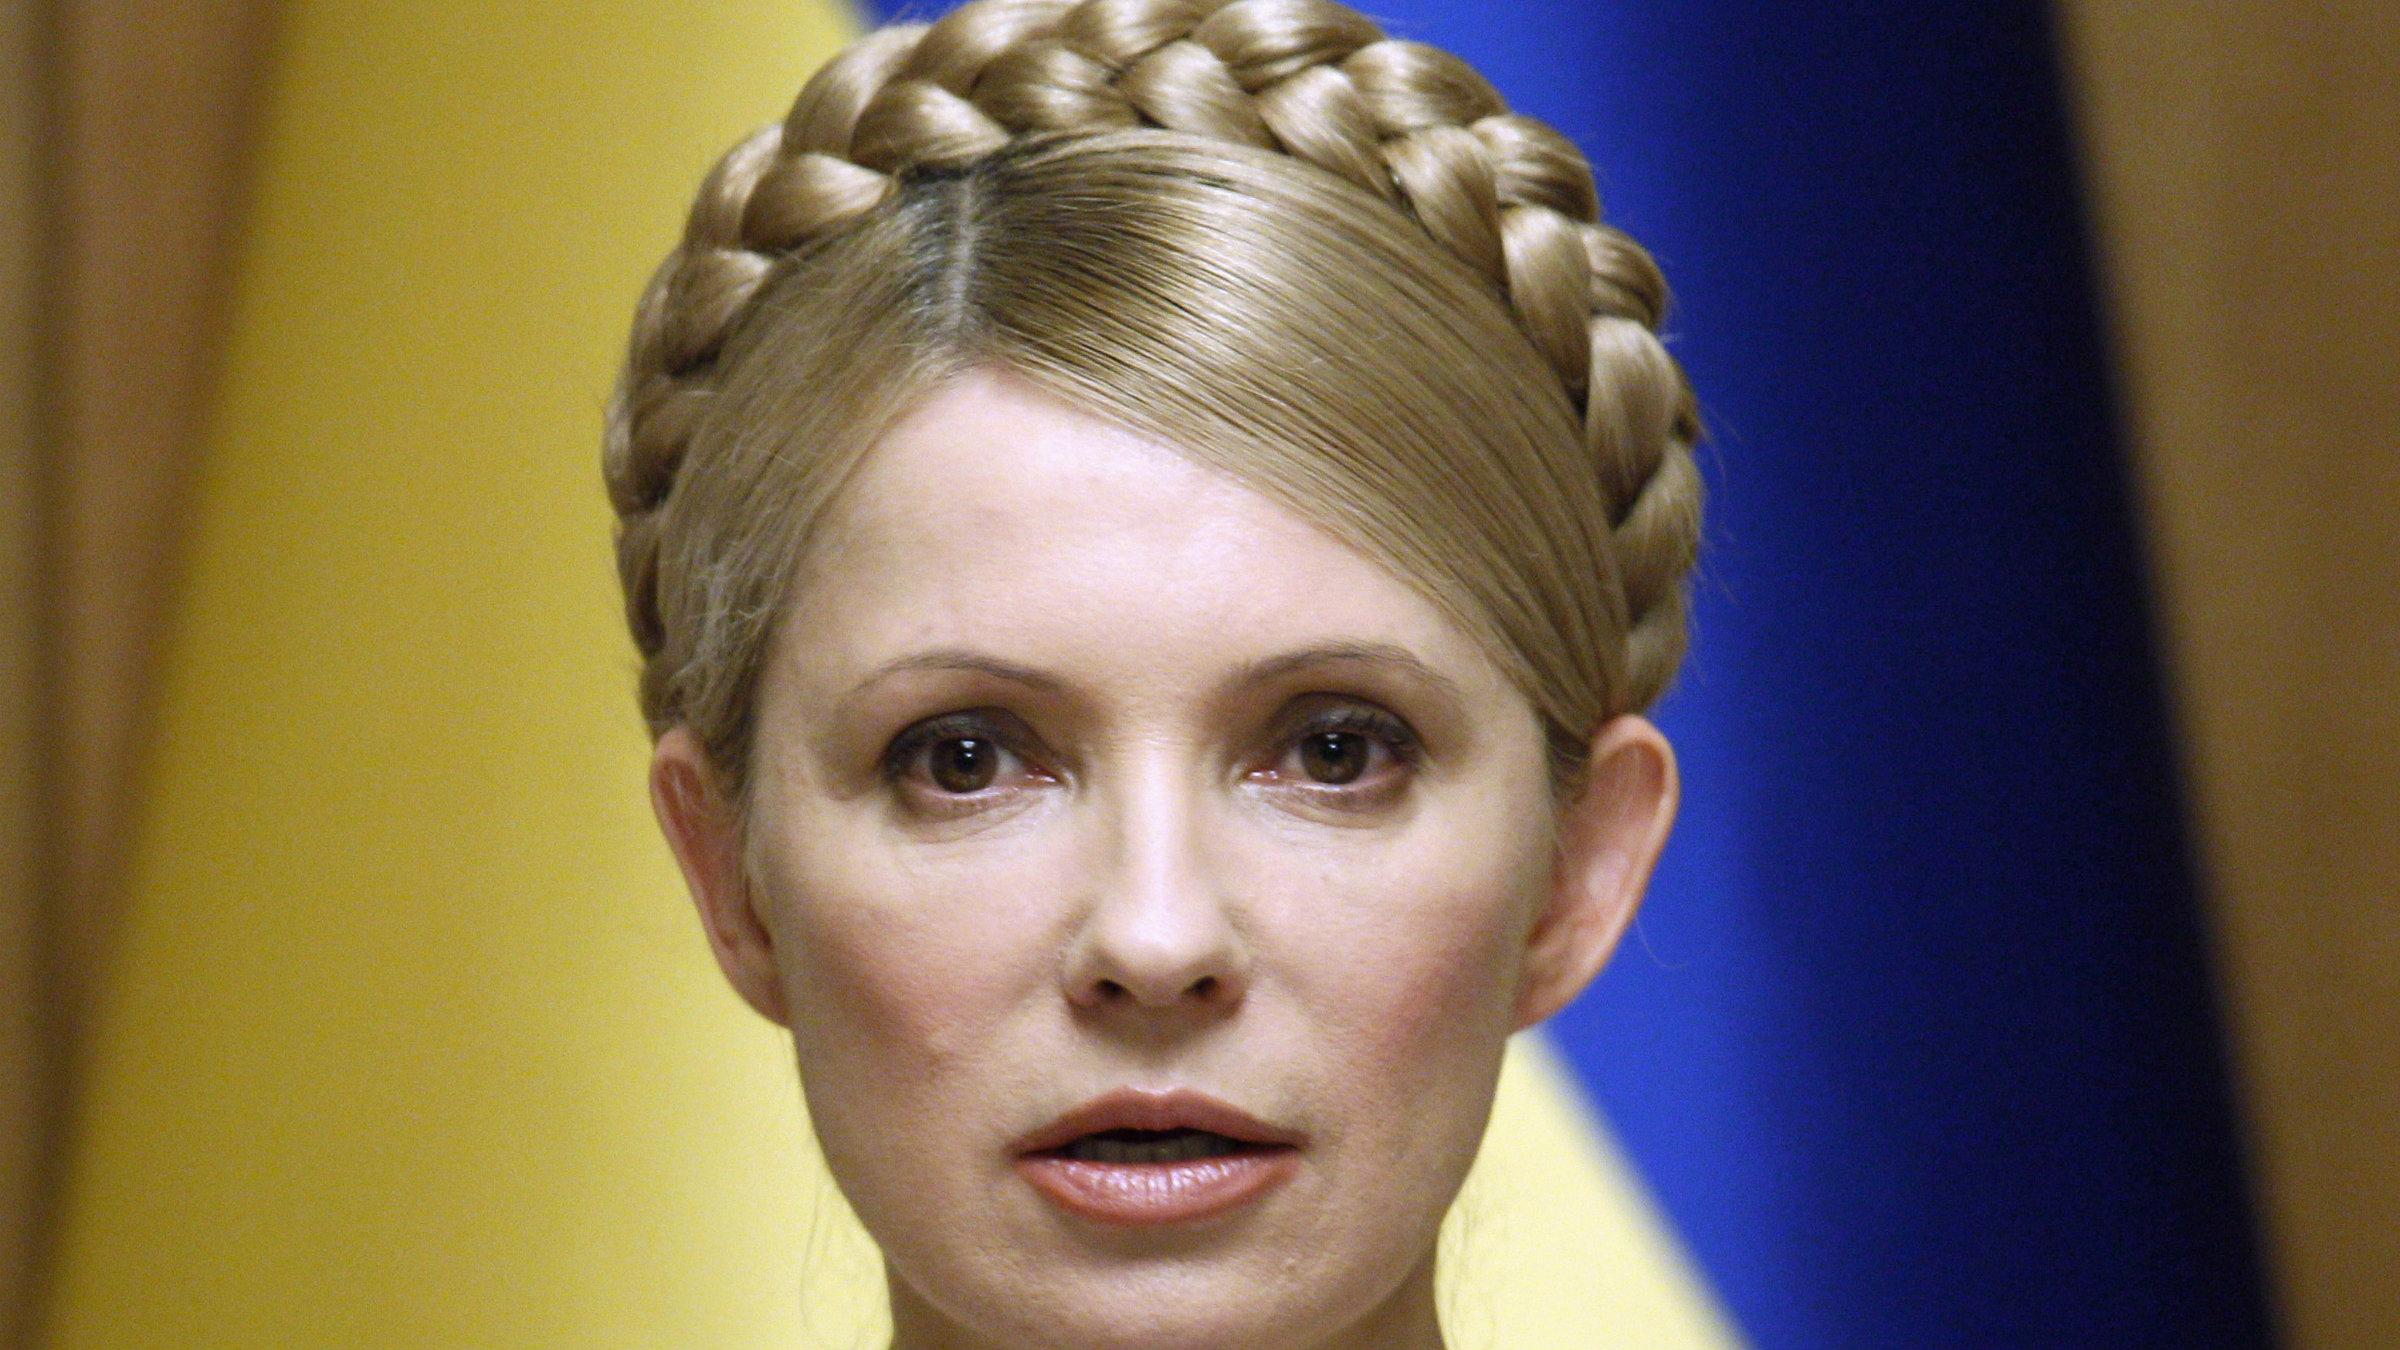 Смешные картинки украина це европа